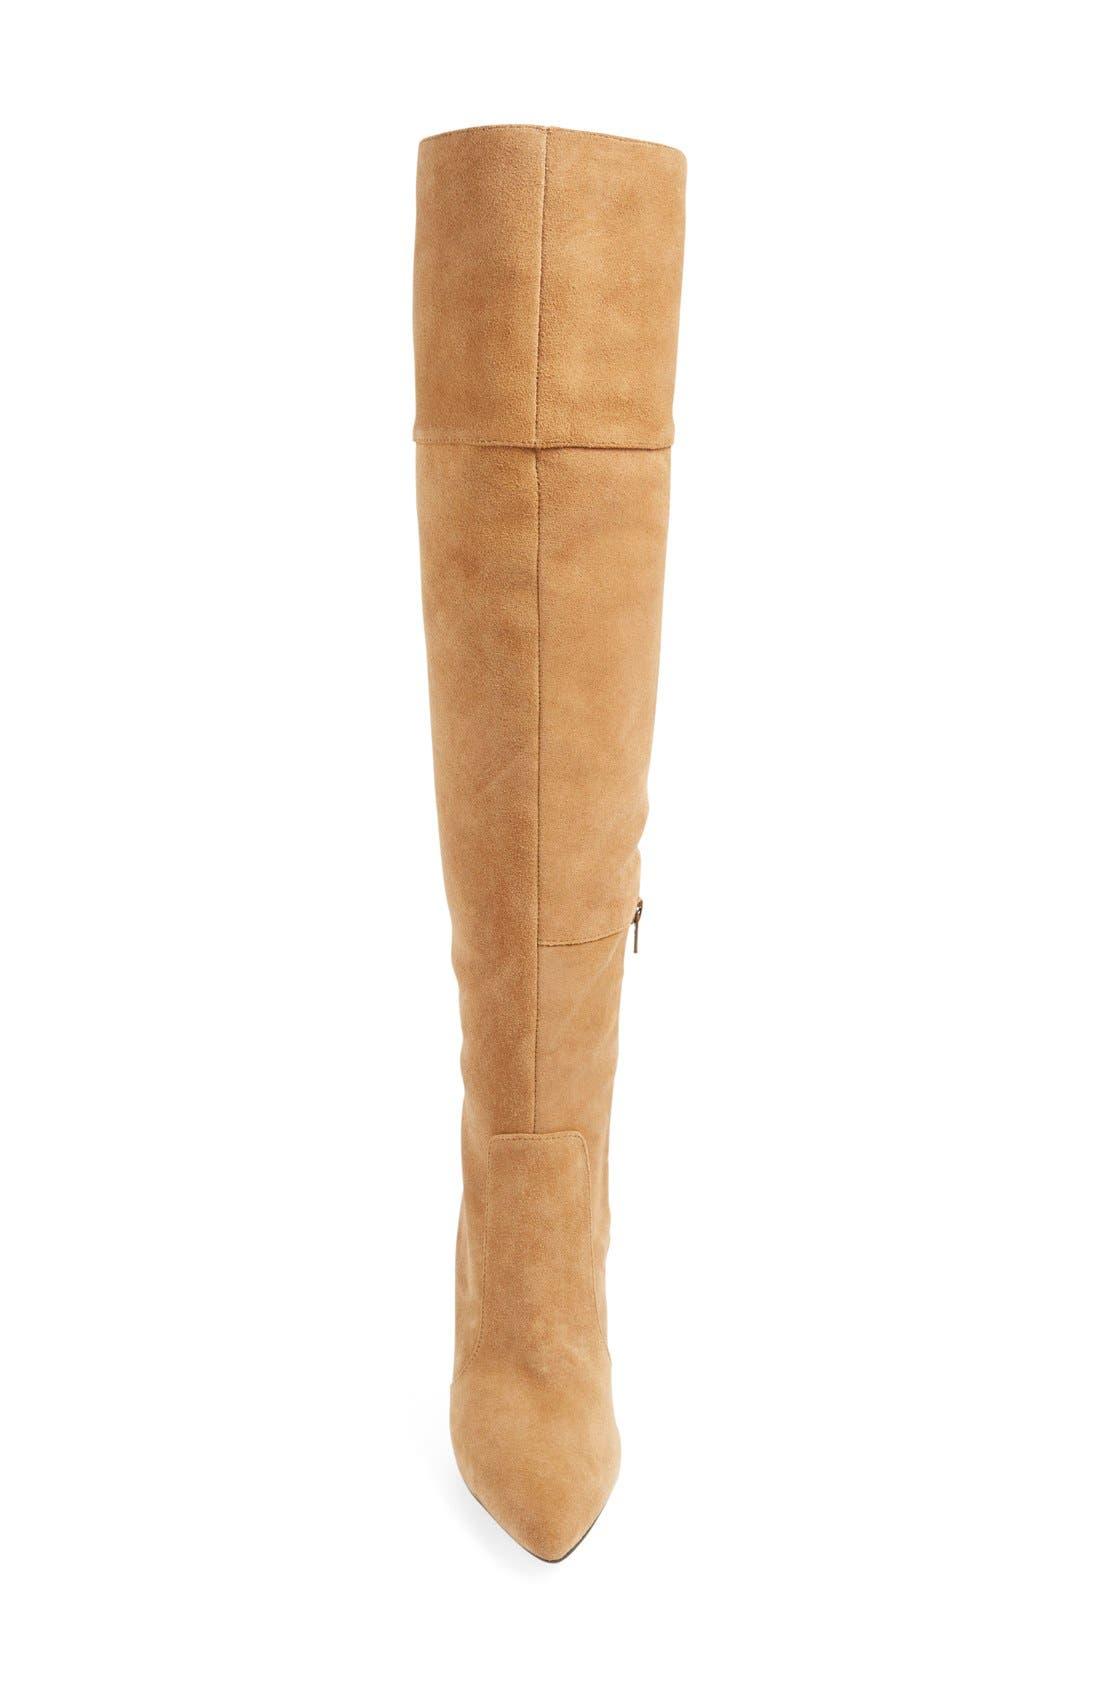 Alternate Image 3  - Jessica Simpson'Parii' Over the Knee Boot (Women)